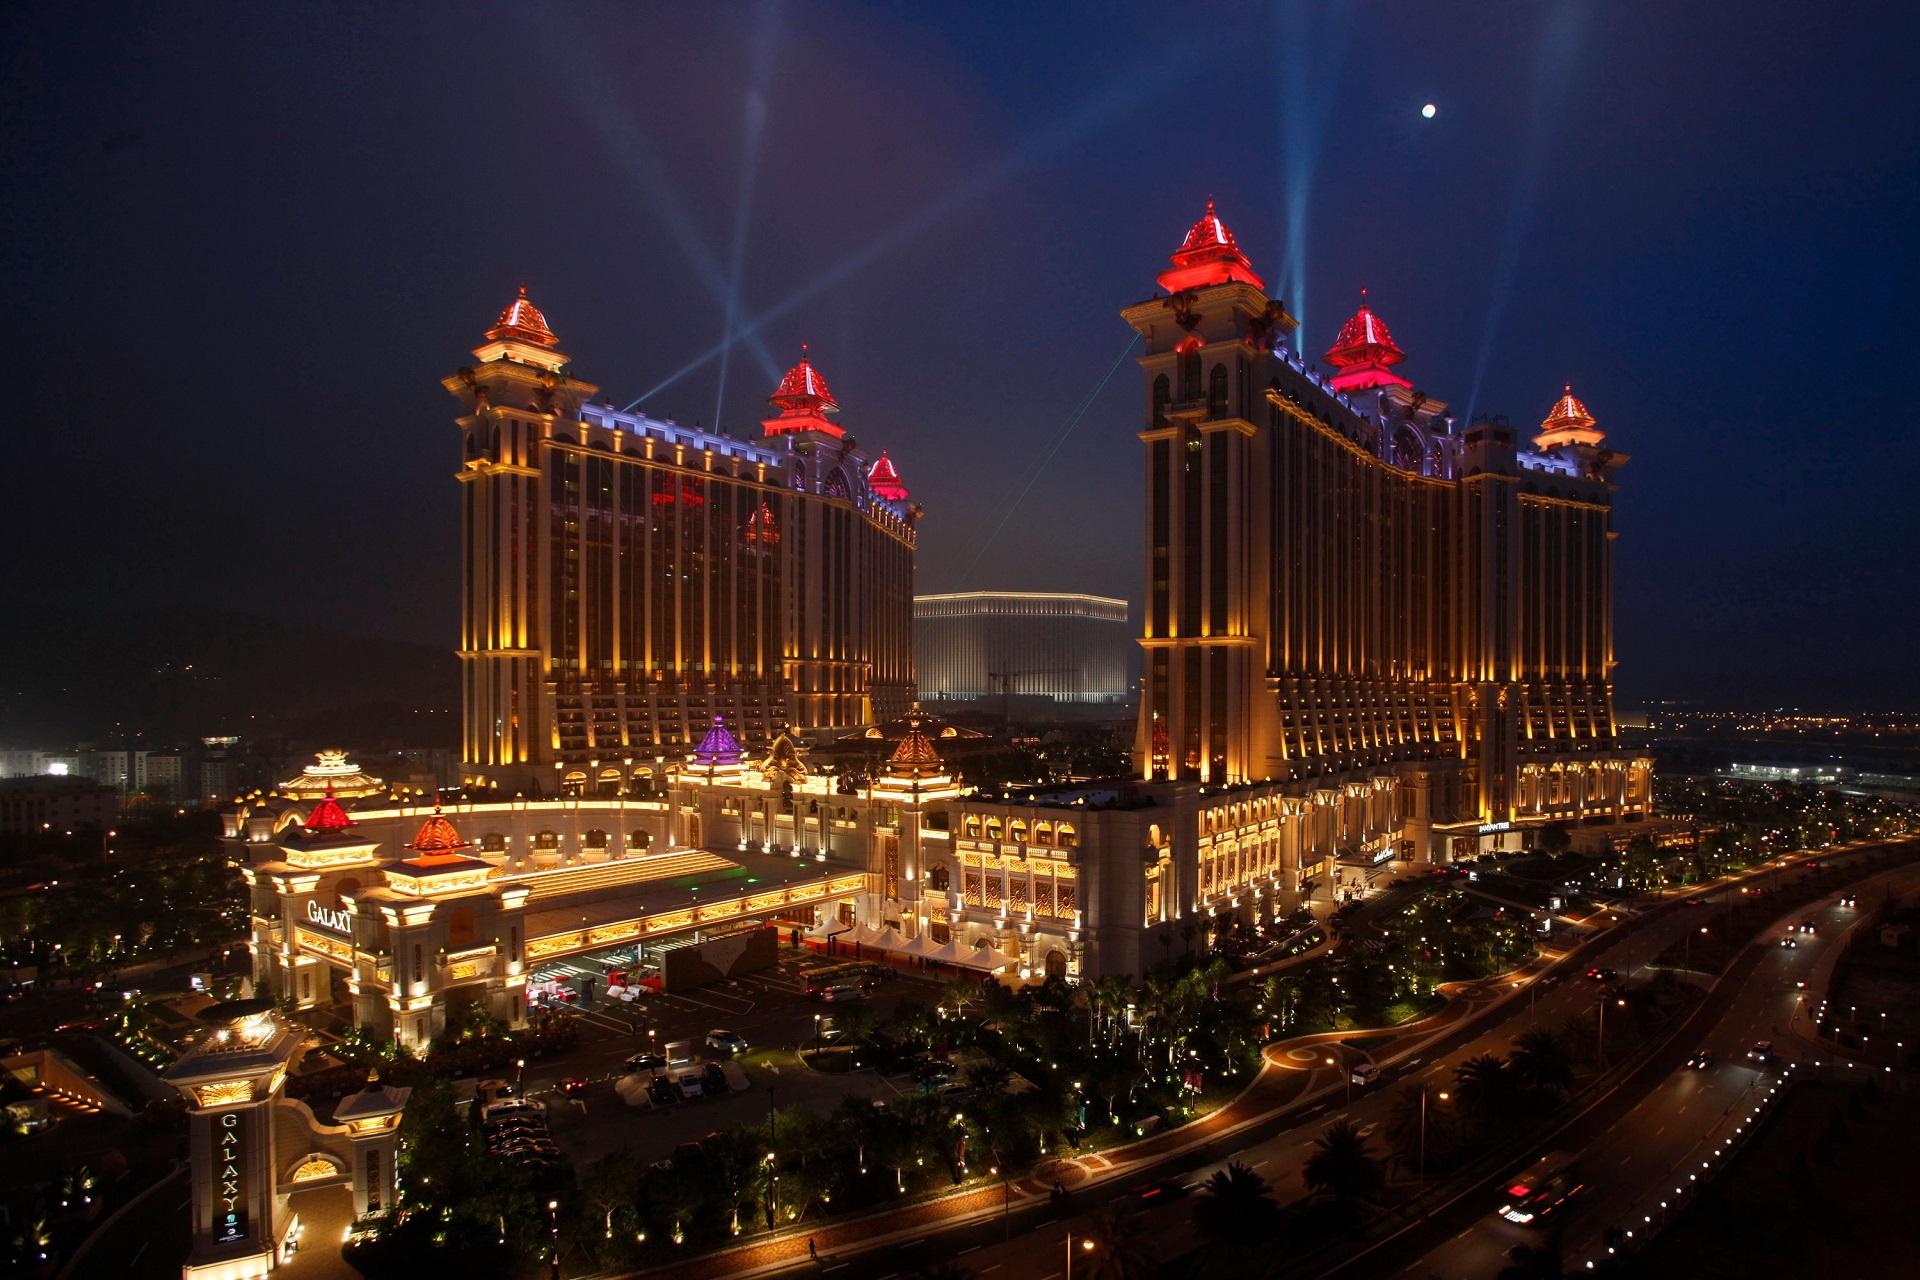 Top 5 cities of Casino tourism